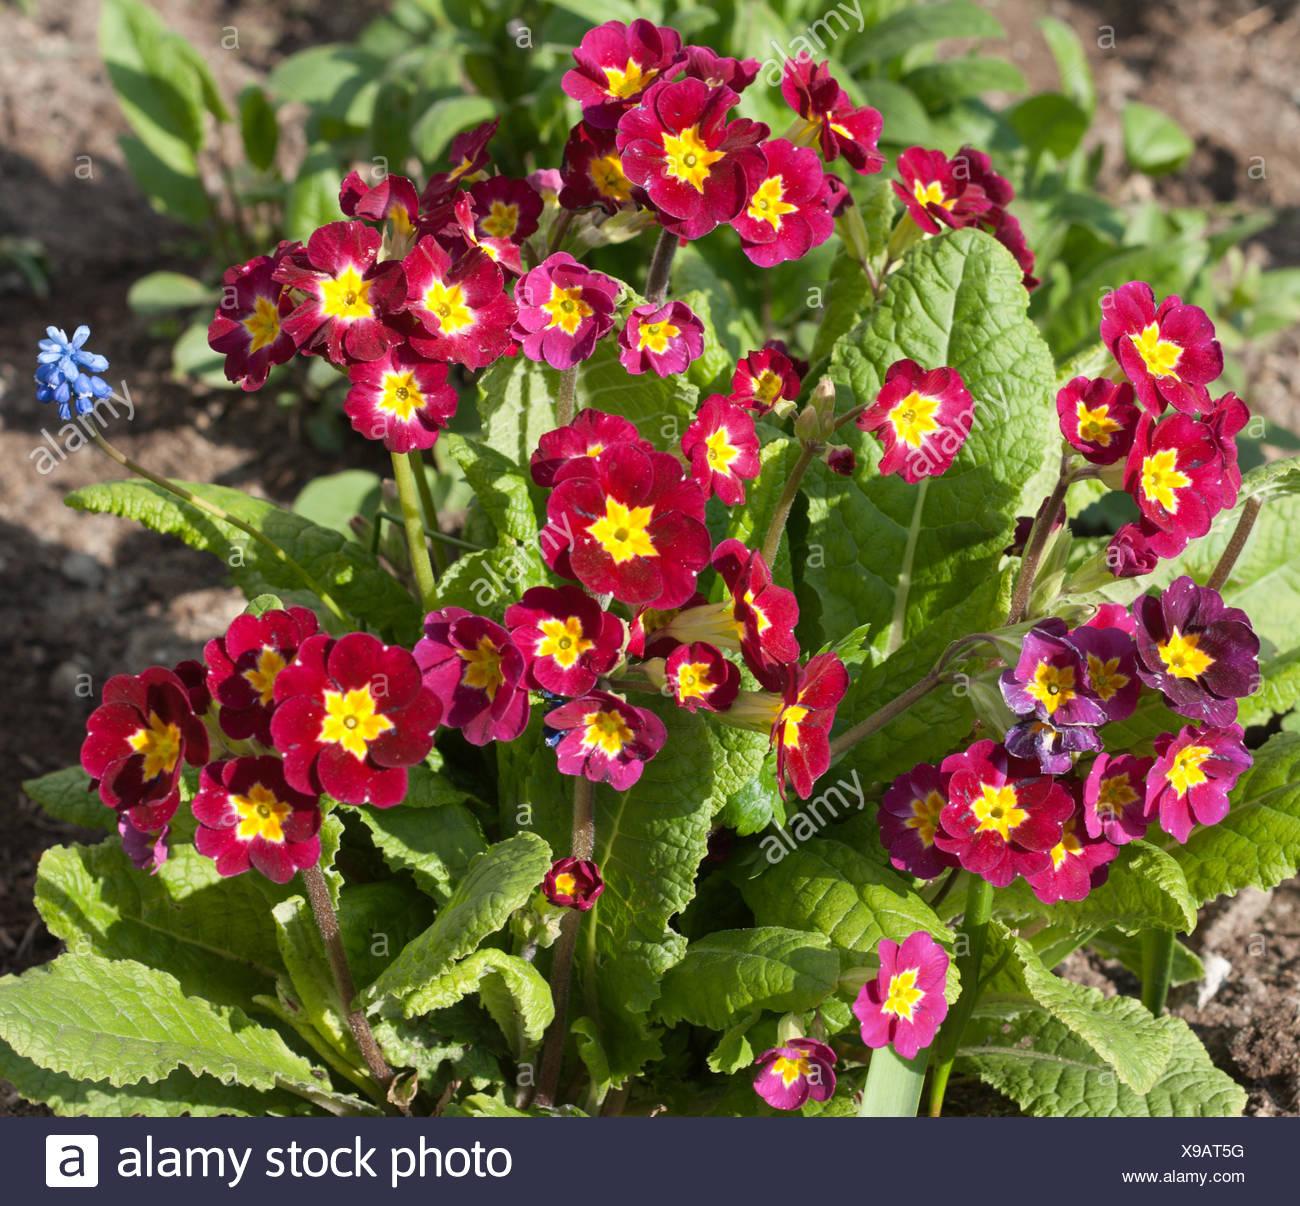 Blue Springtime Flowers Stockfotos & Blue Springtime Flowers Bilder ...